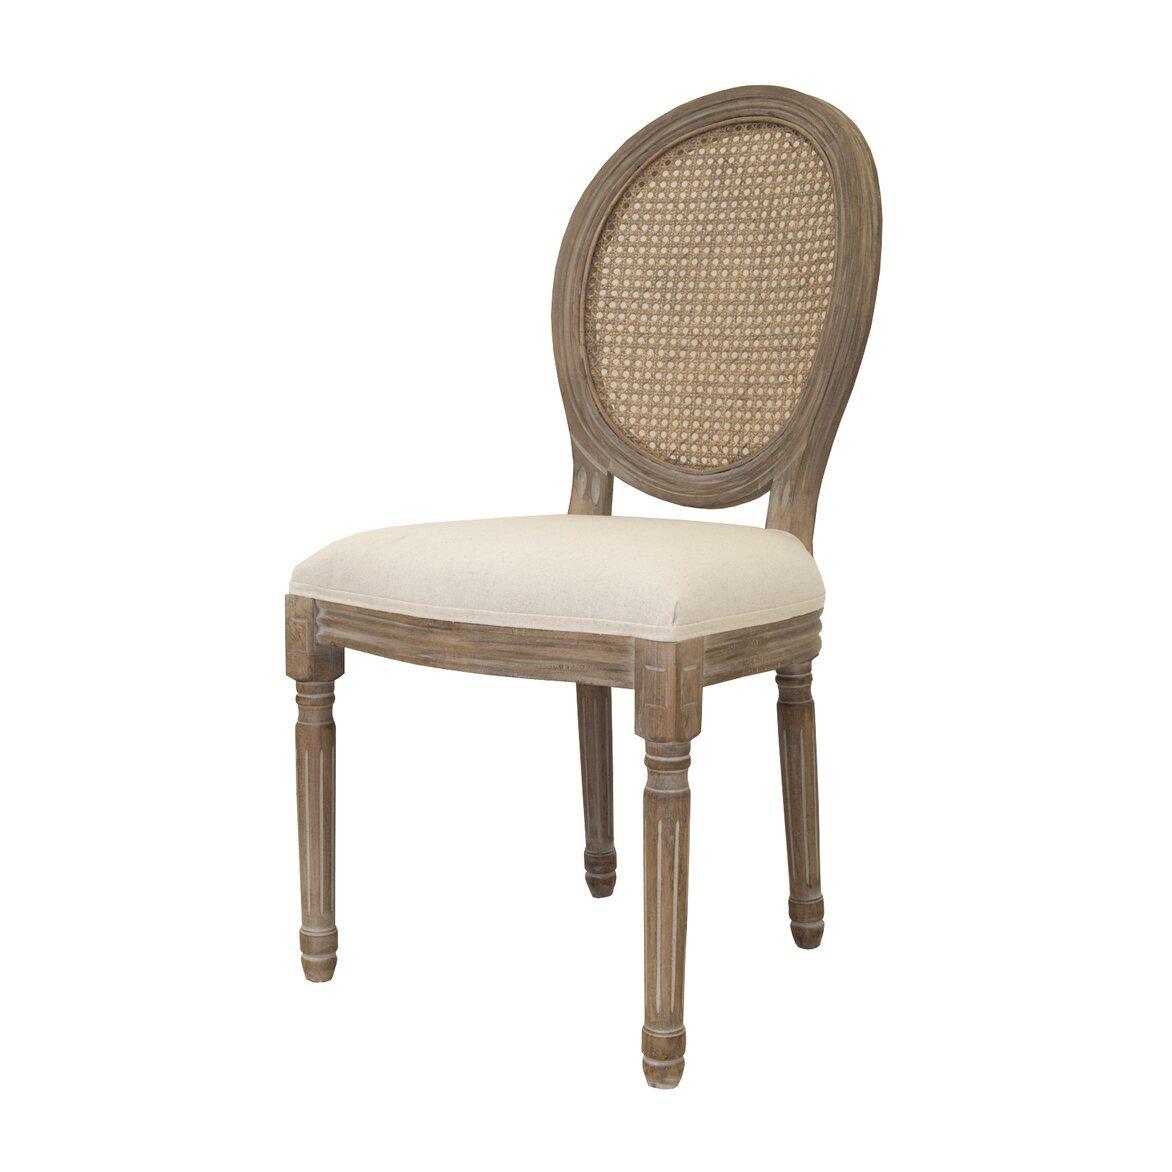 Стул Memos ver.2 4 | Обеденные стулья Kingsby